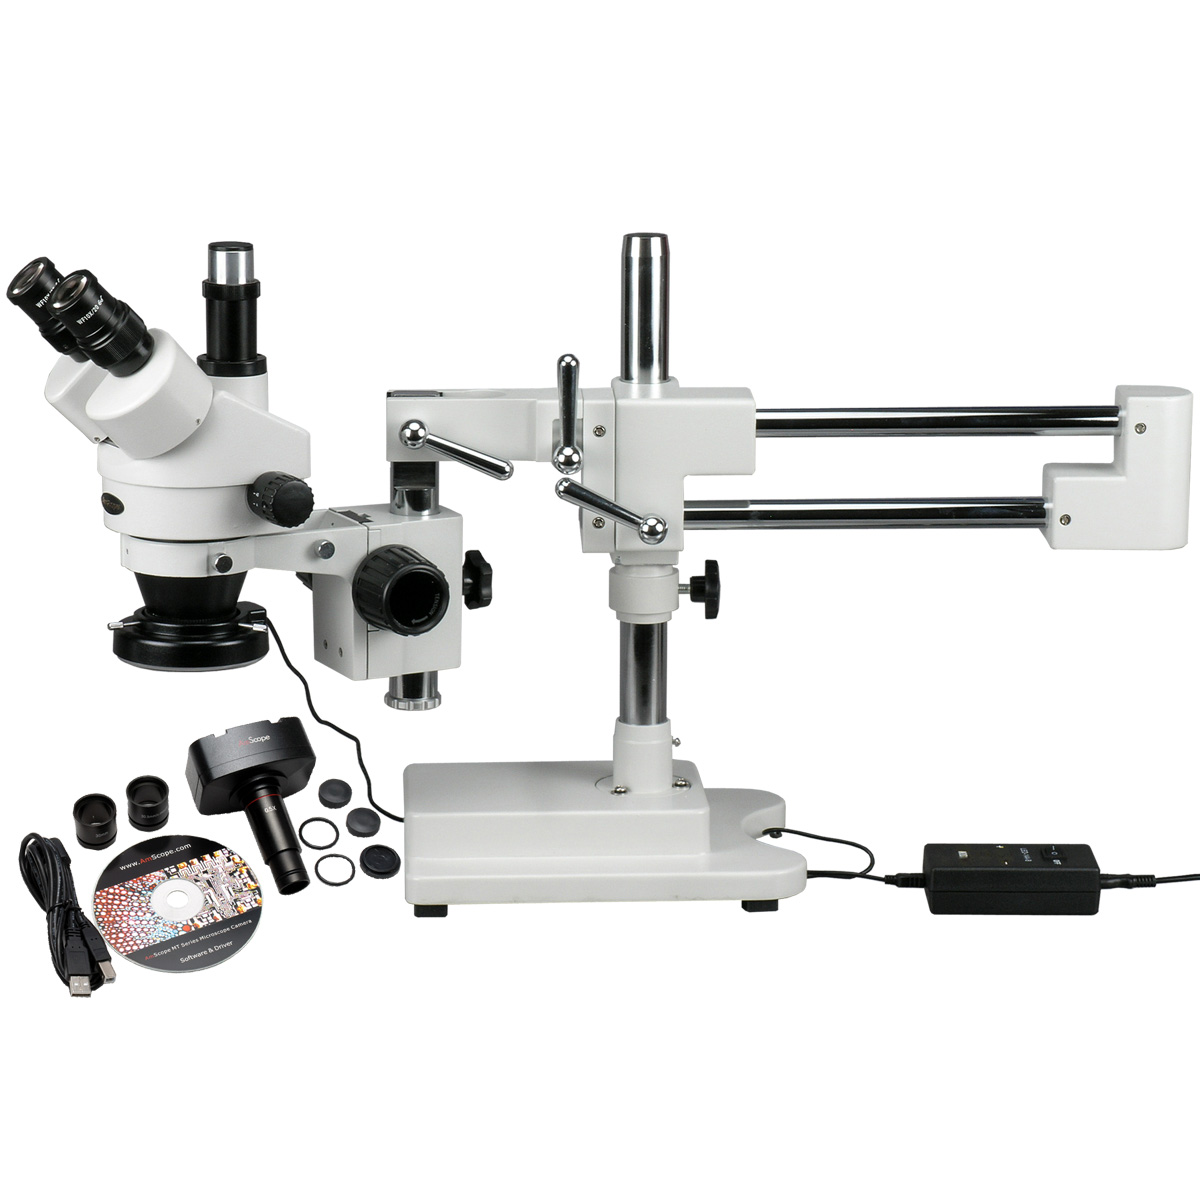 AmScope 3.5X-90X Circuit Zoom Stereo Microscope + 144 LED Light + 10MP Digital Camera New